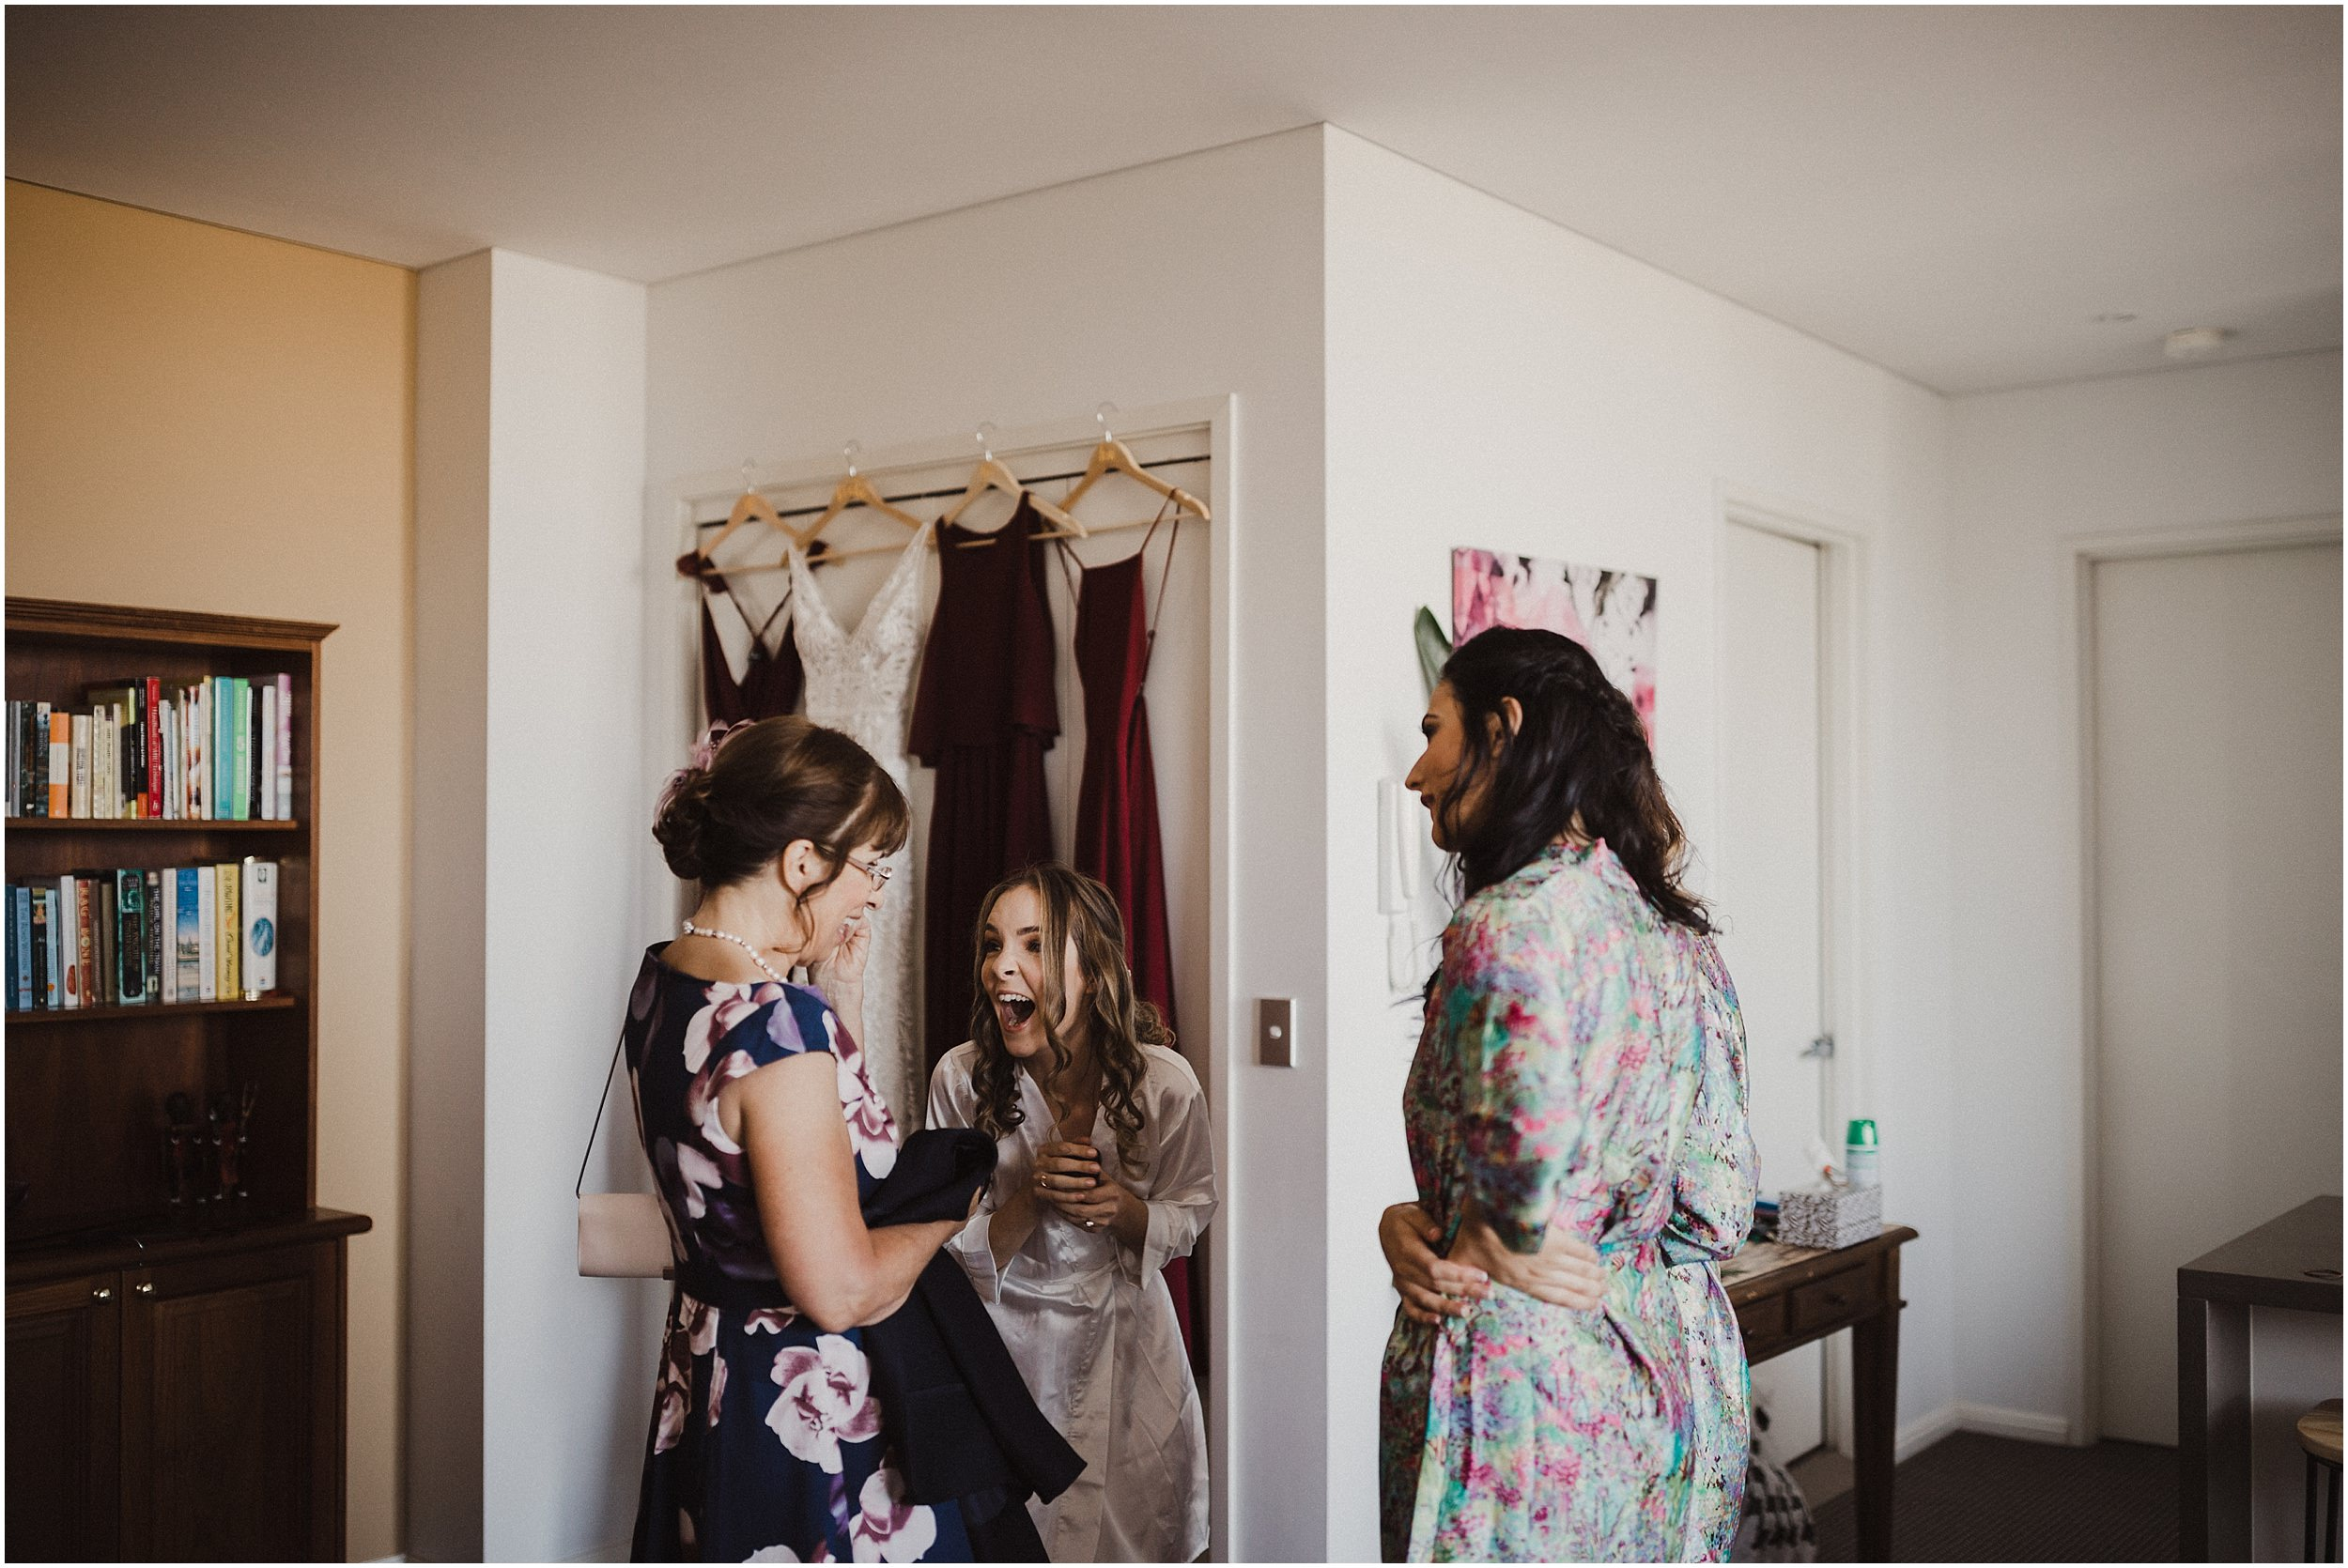 Sydney Wedding - Tiffany & Co gift